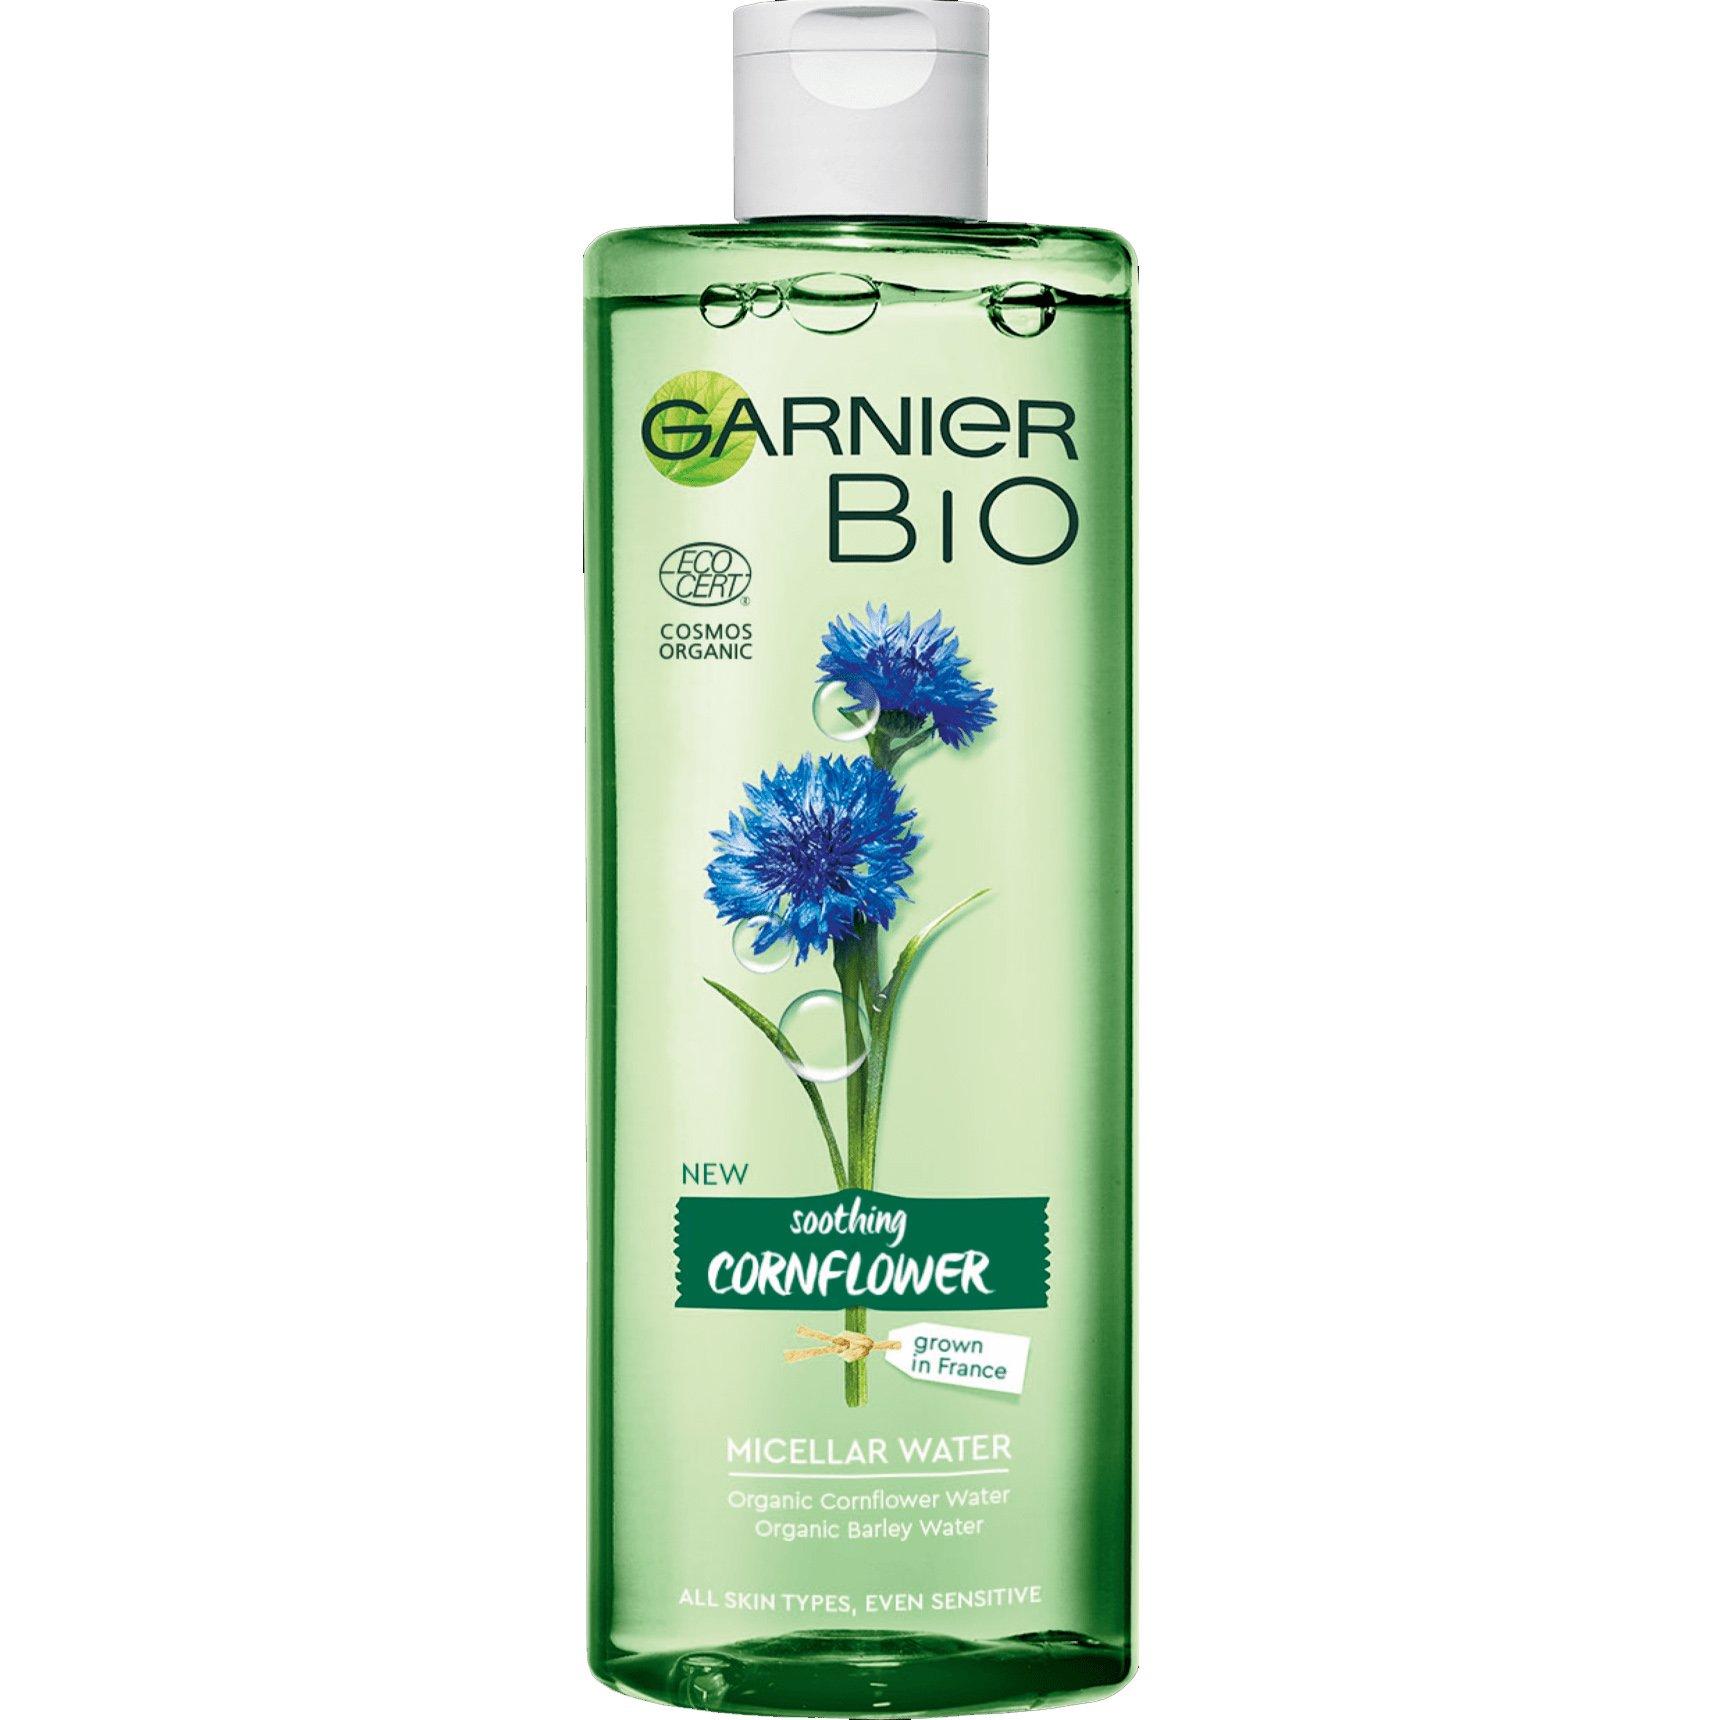 Garnier Bio Soothing Cornflower Micellaire Water Νερό Καθαρισμού με Βιολογικό Εκχύλισμα Κενταύριας 400ml